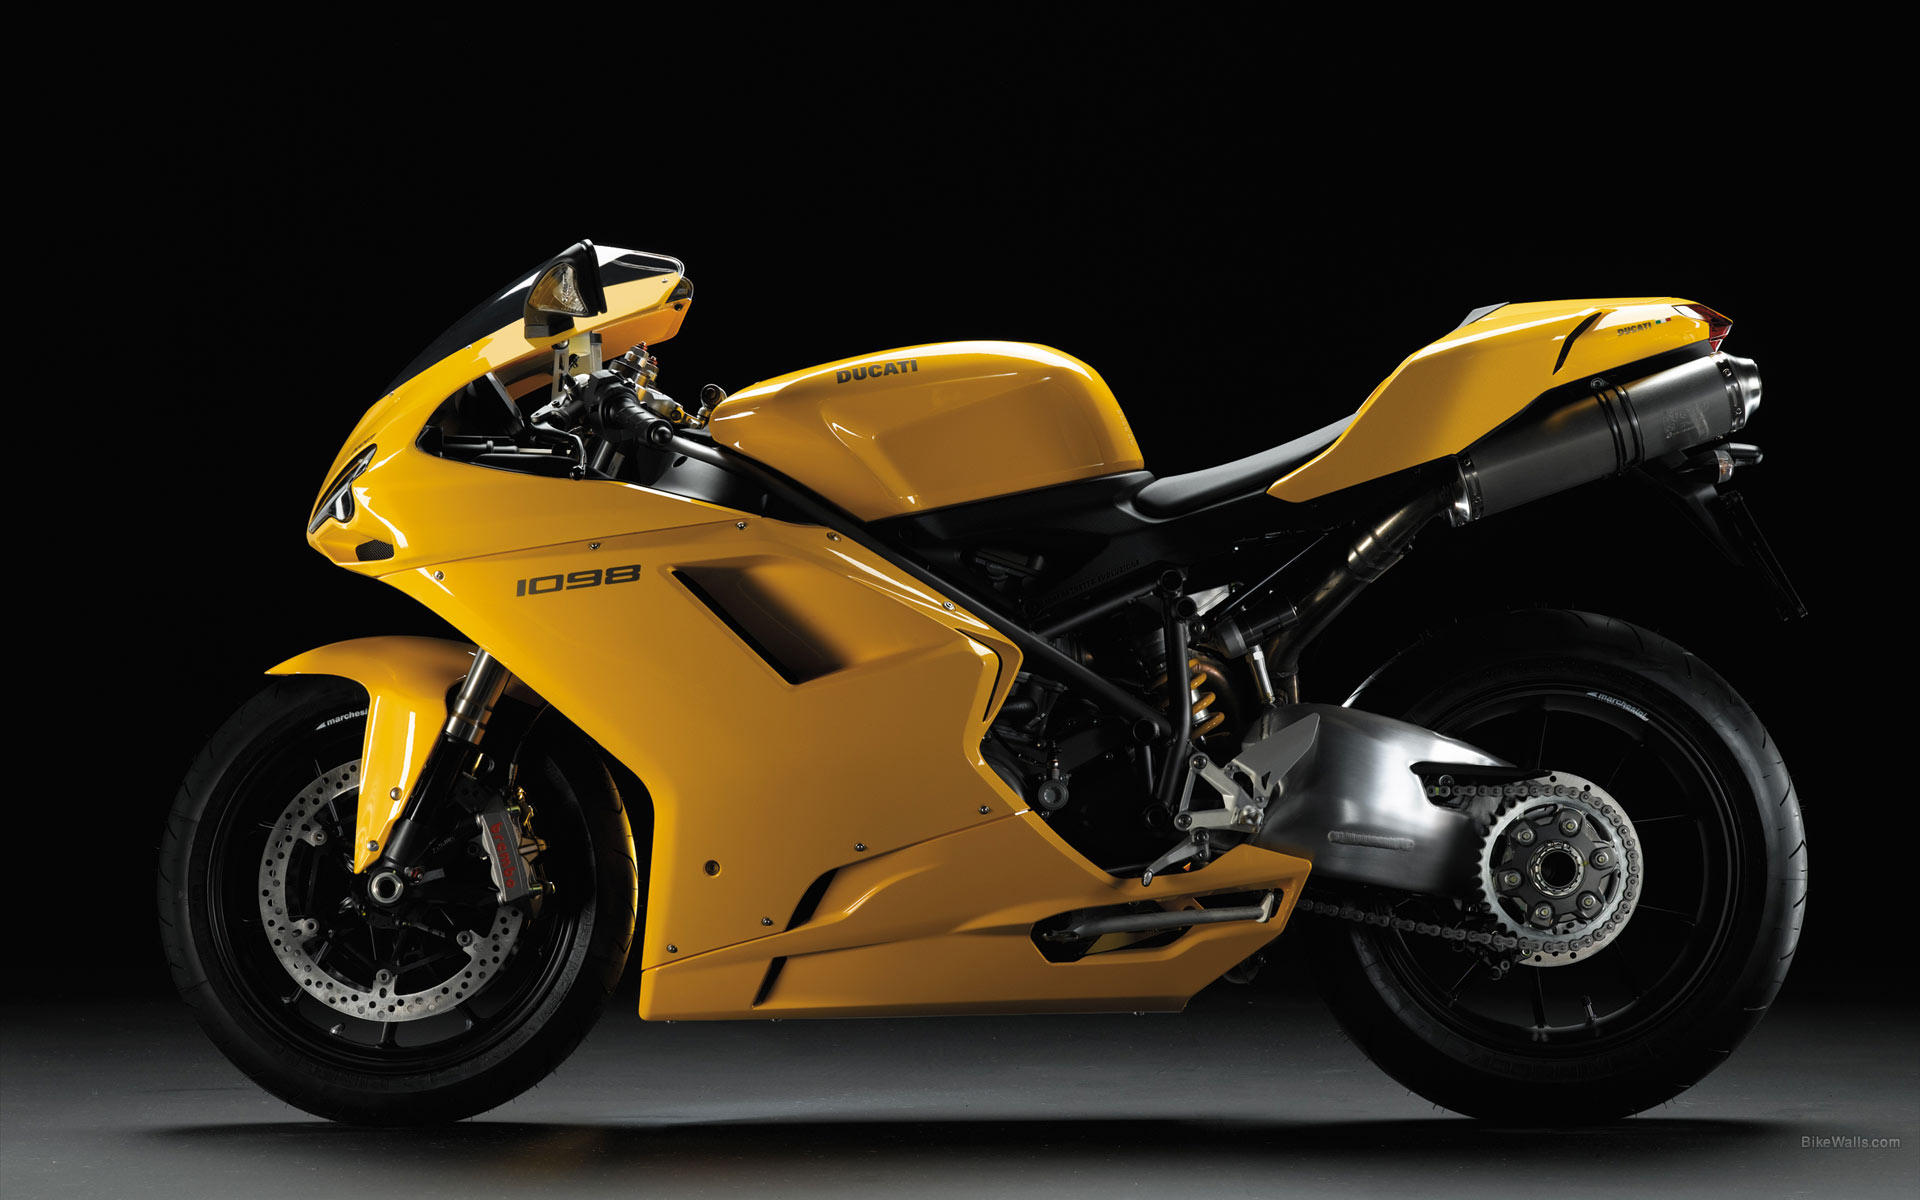 Free Download Ducati 1098 17596 Hd Wallpapers In Bikes